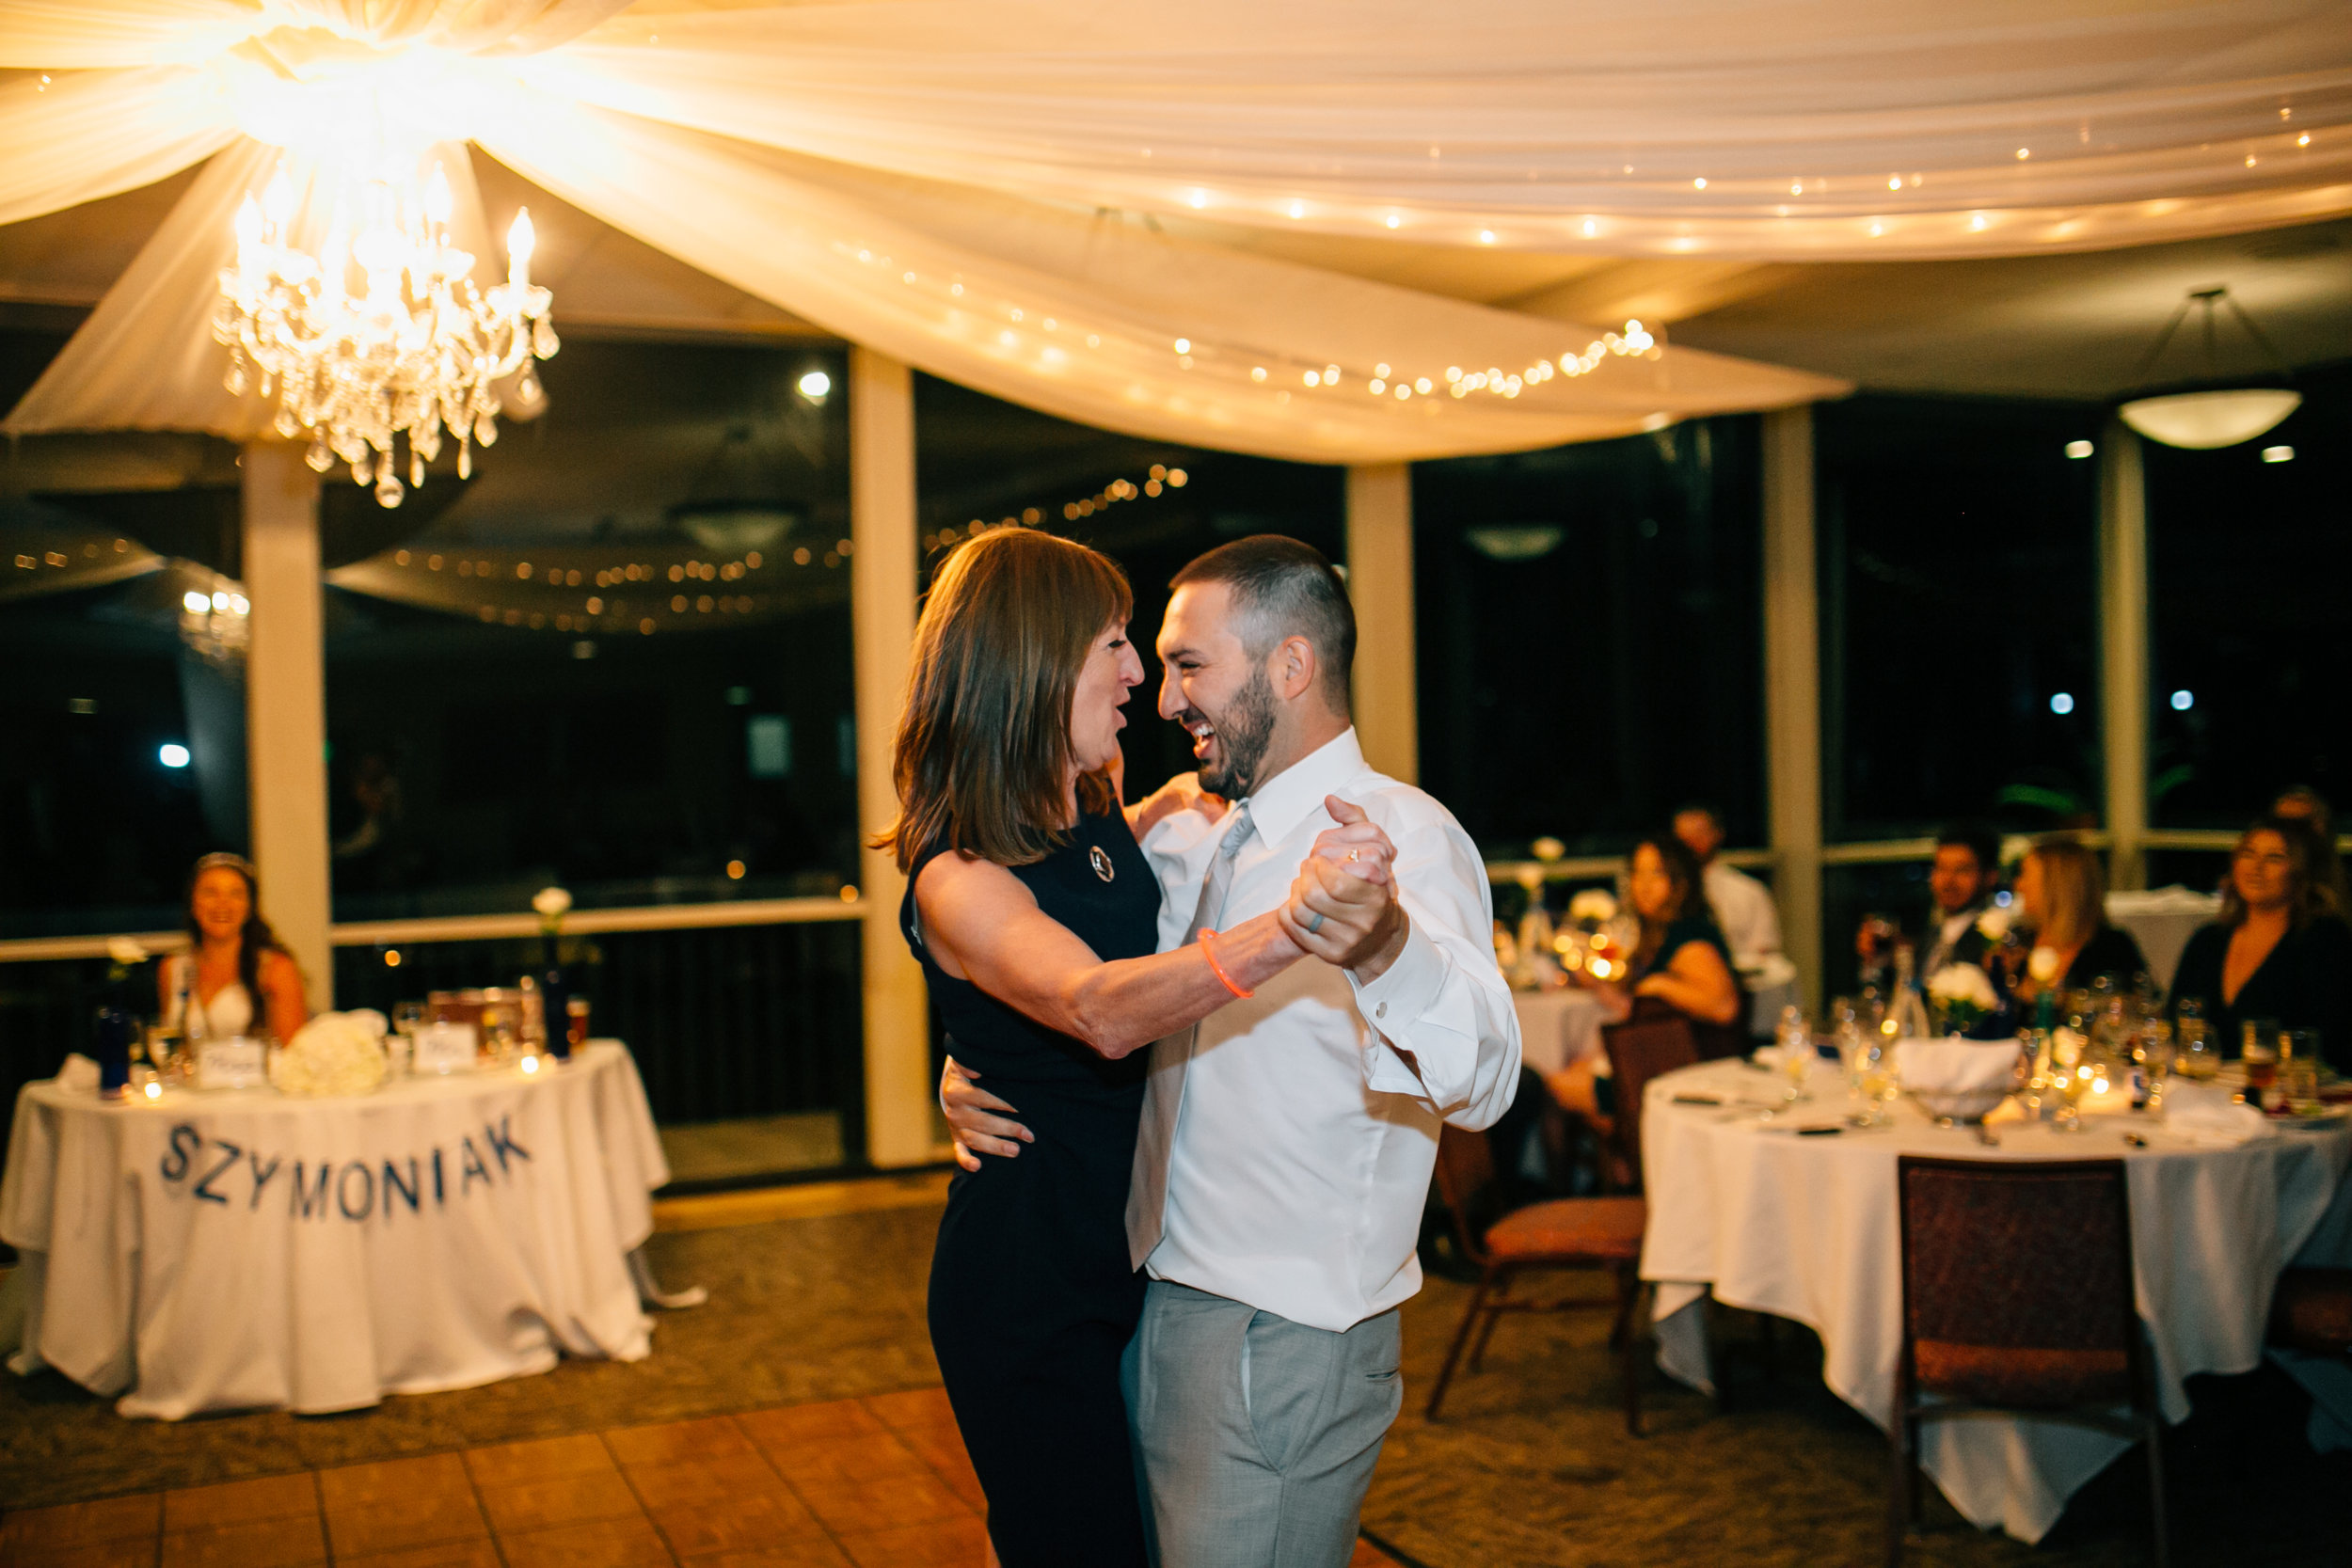 Szymoniak Wedding, 2016 (391 of 453).jpg